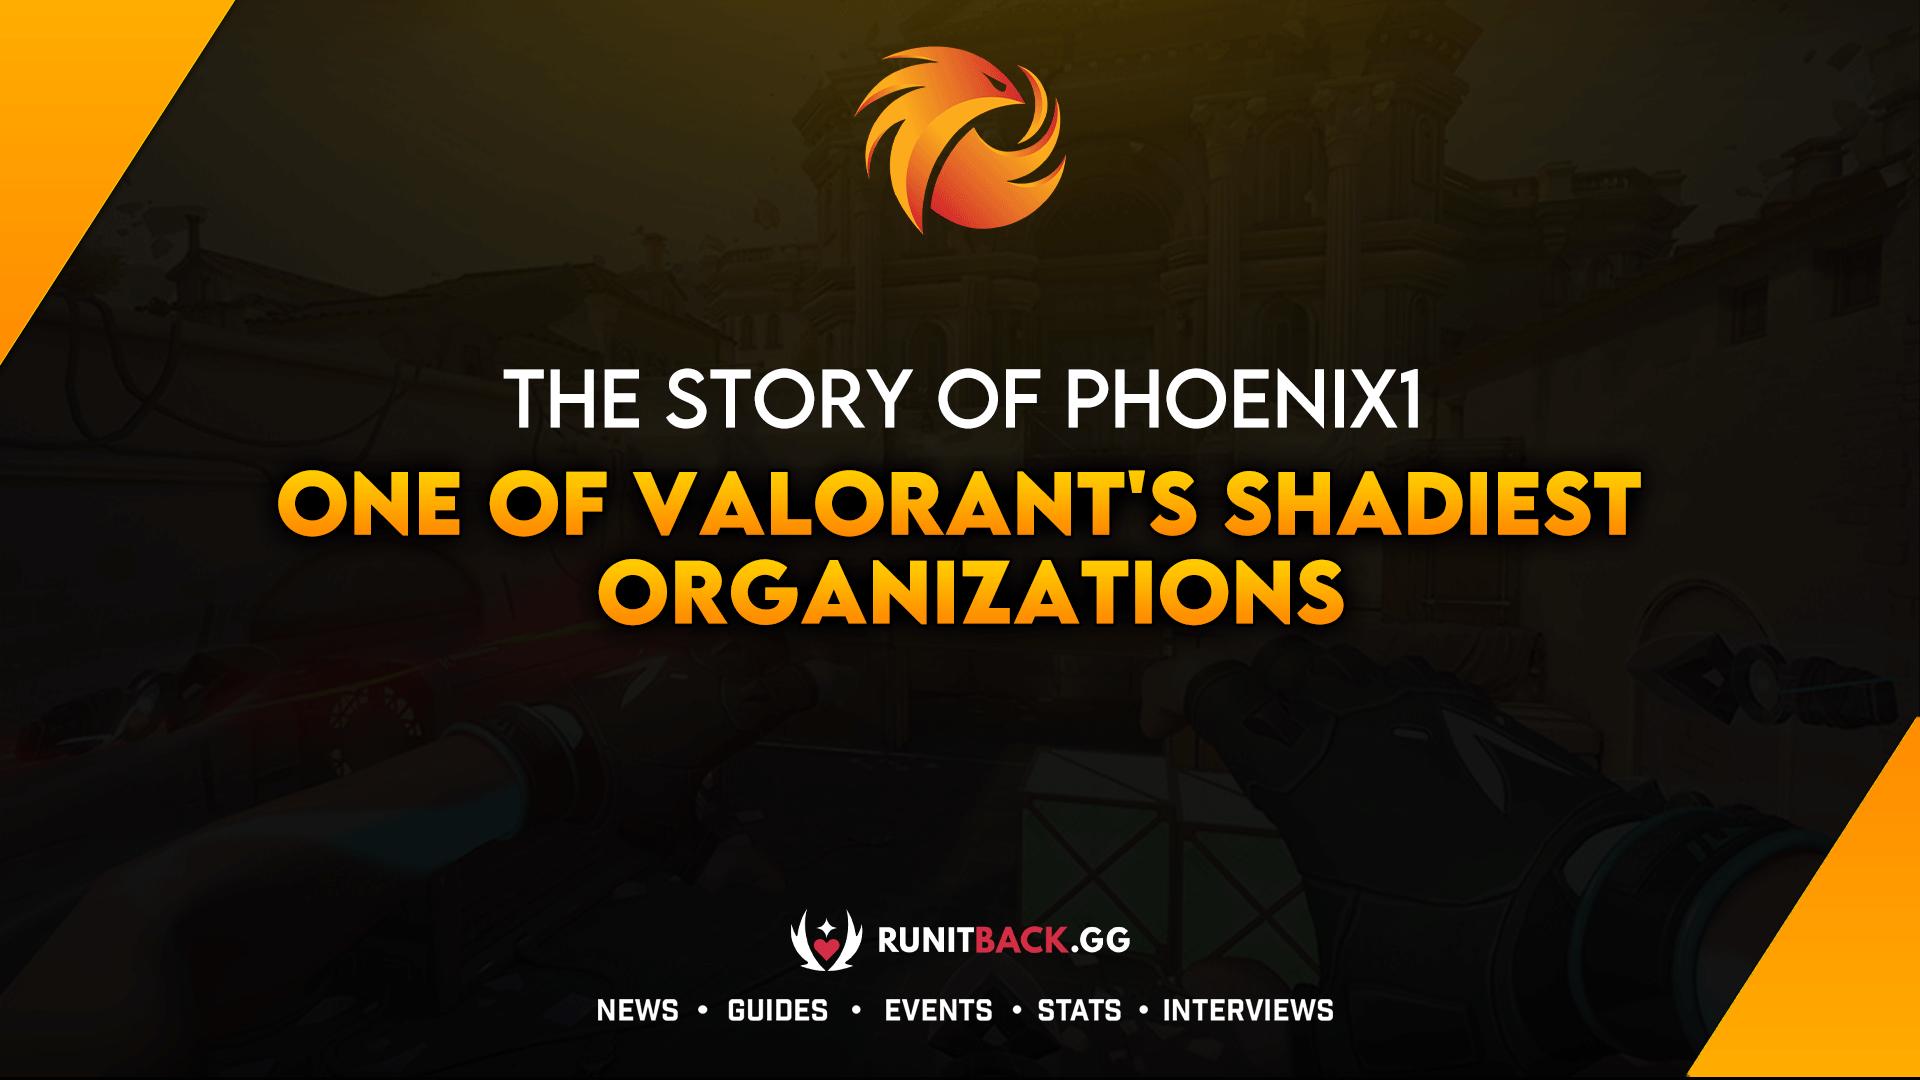 The Story of Phoenix1: One of Valorant's Shadiest Organizations